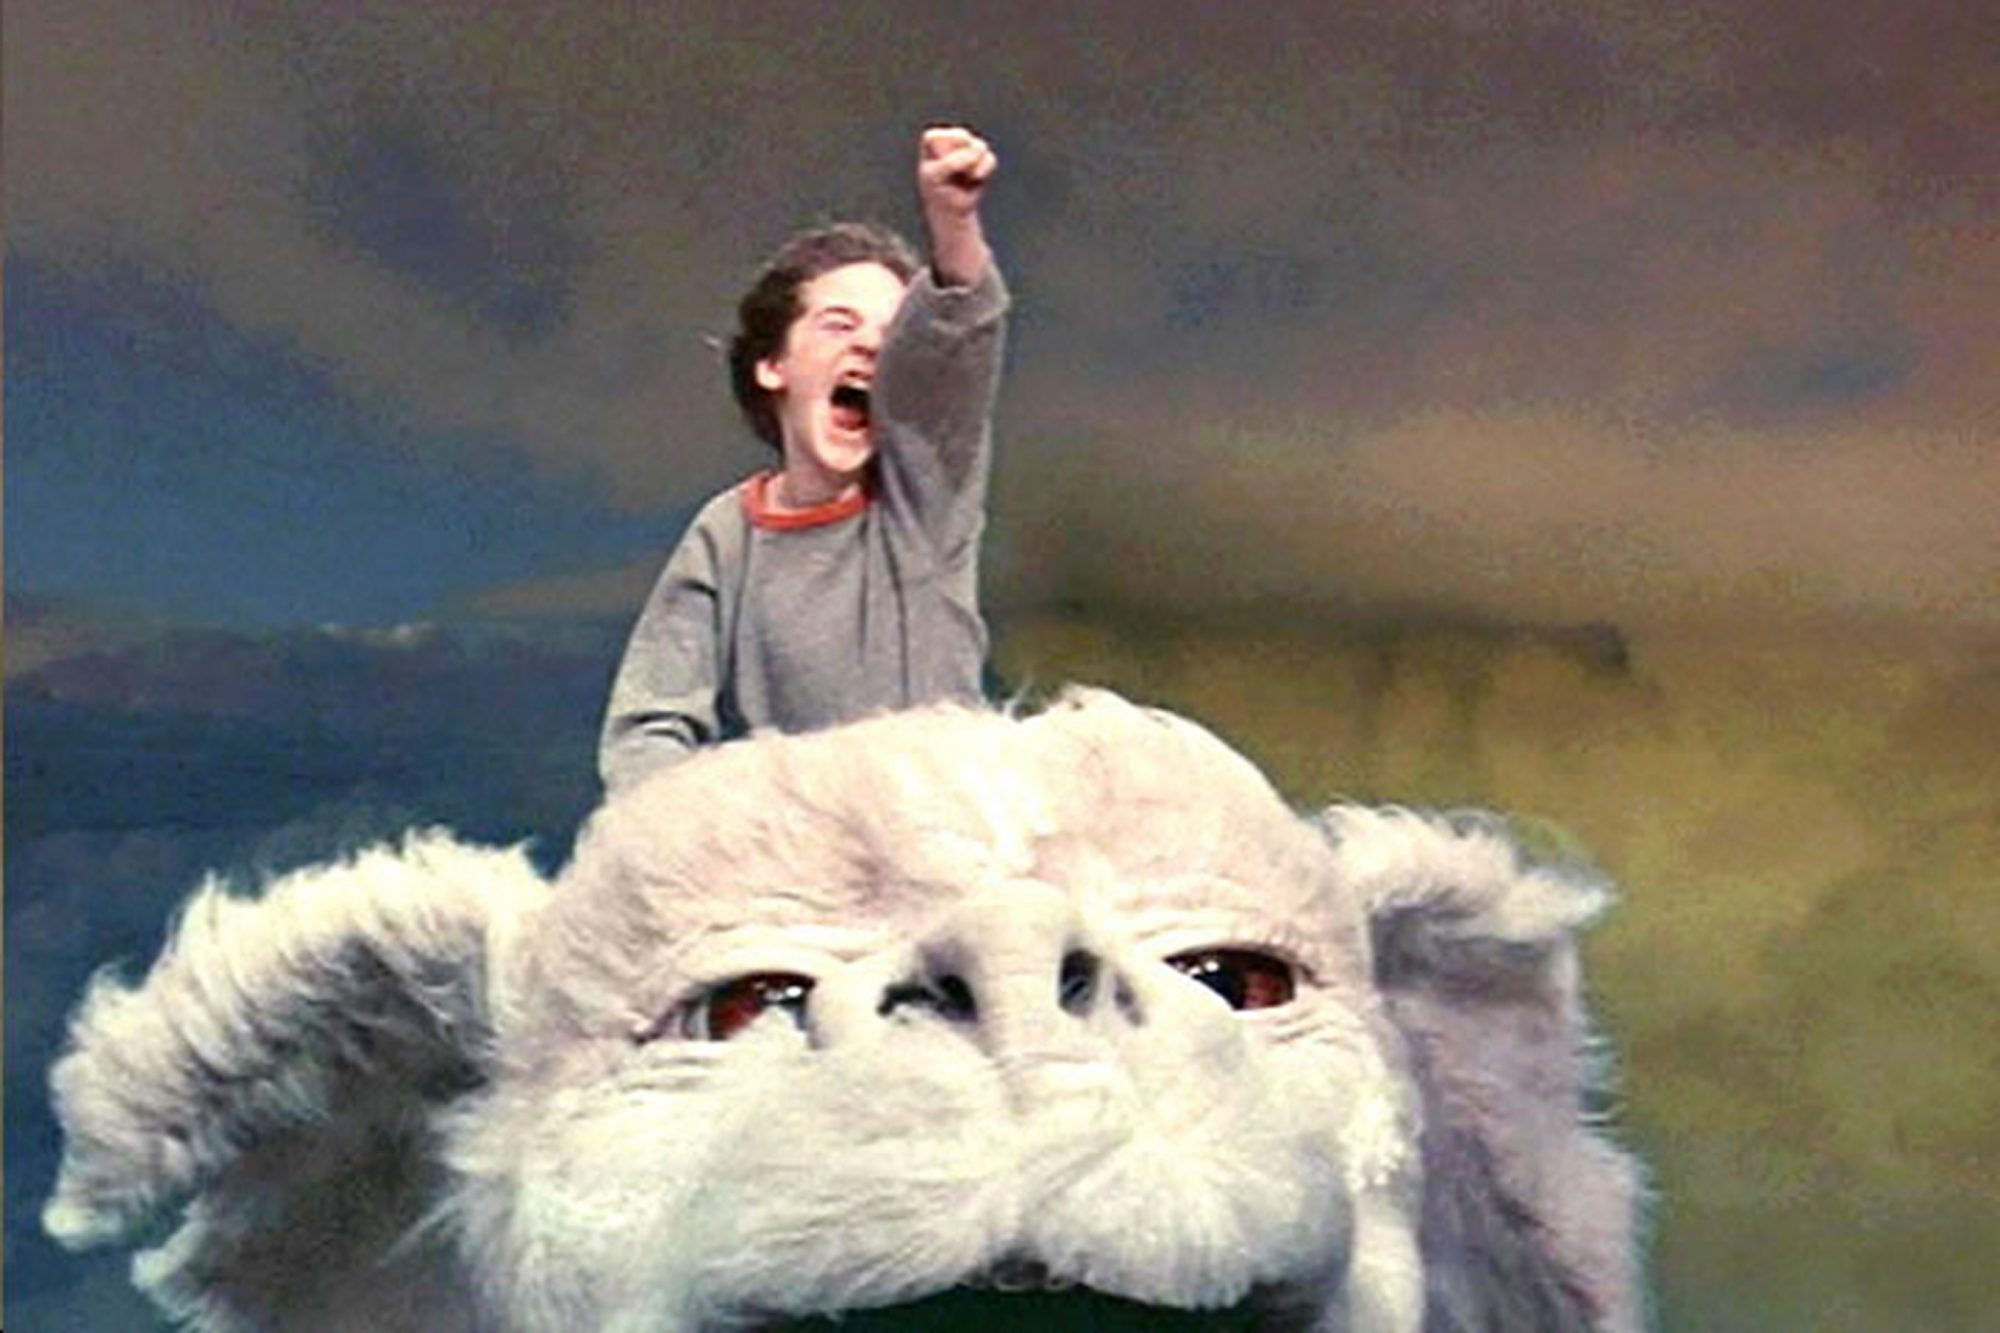 The NeverEnding Story (1984) (Screengrab)